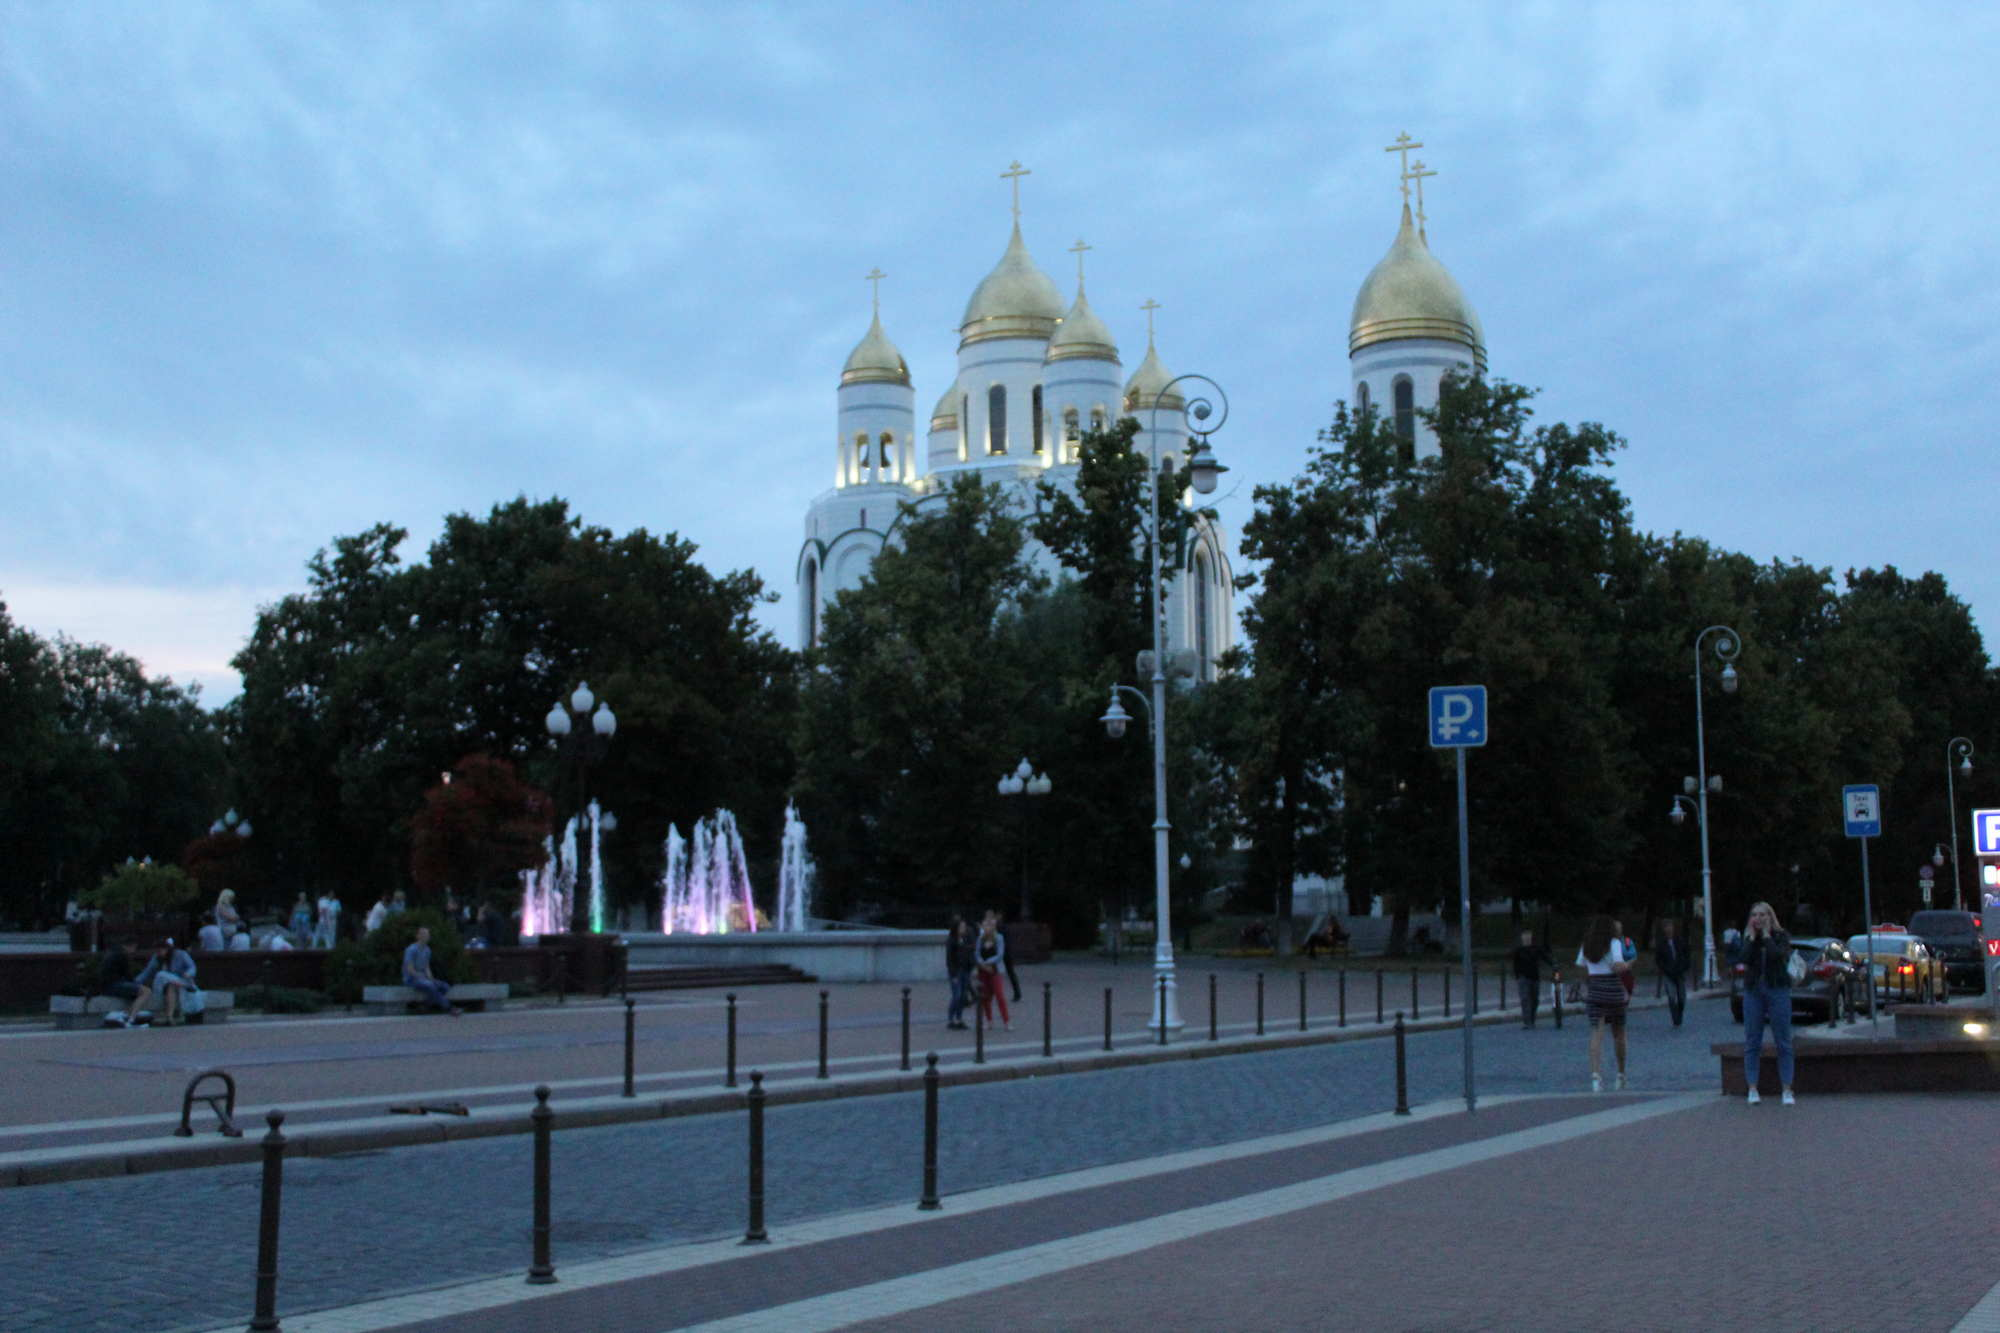 Собор Христа Спасителя в Калининграде